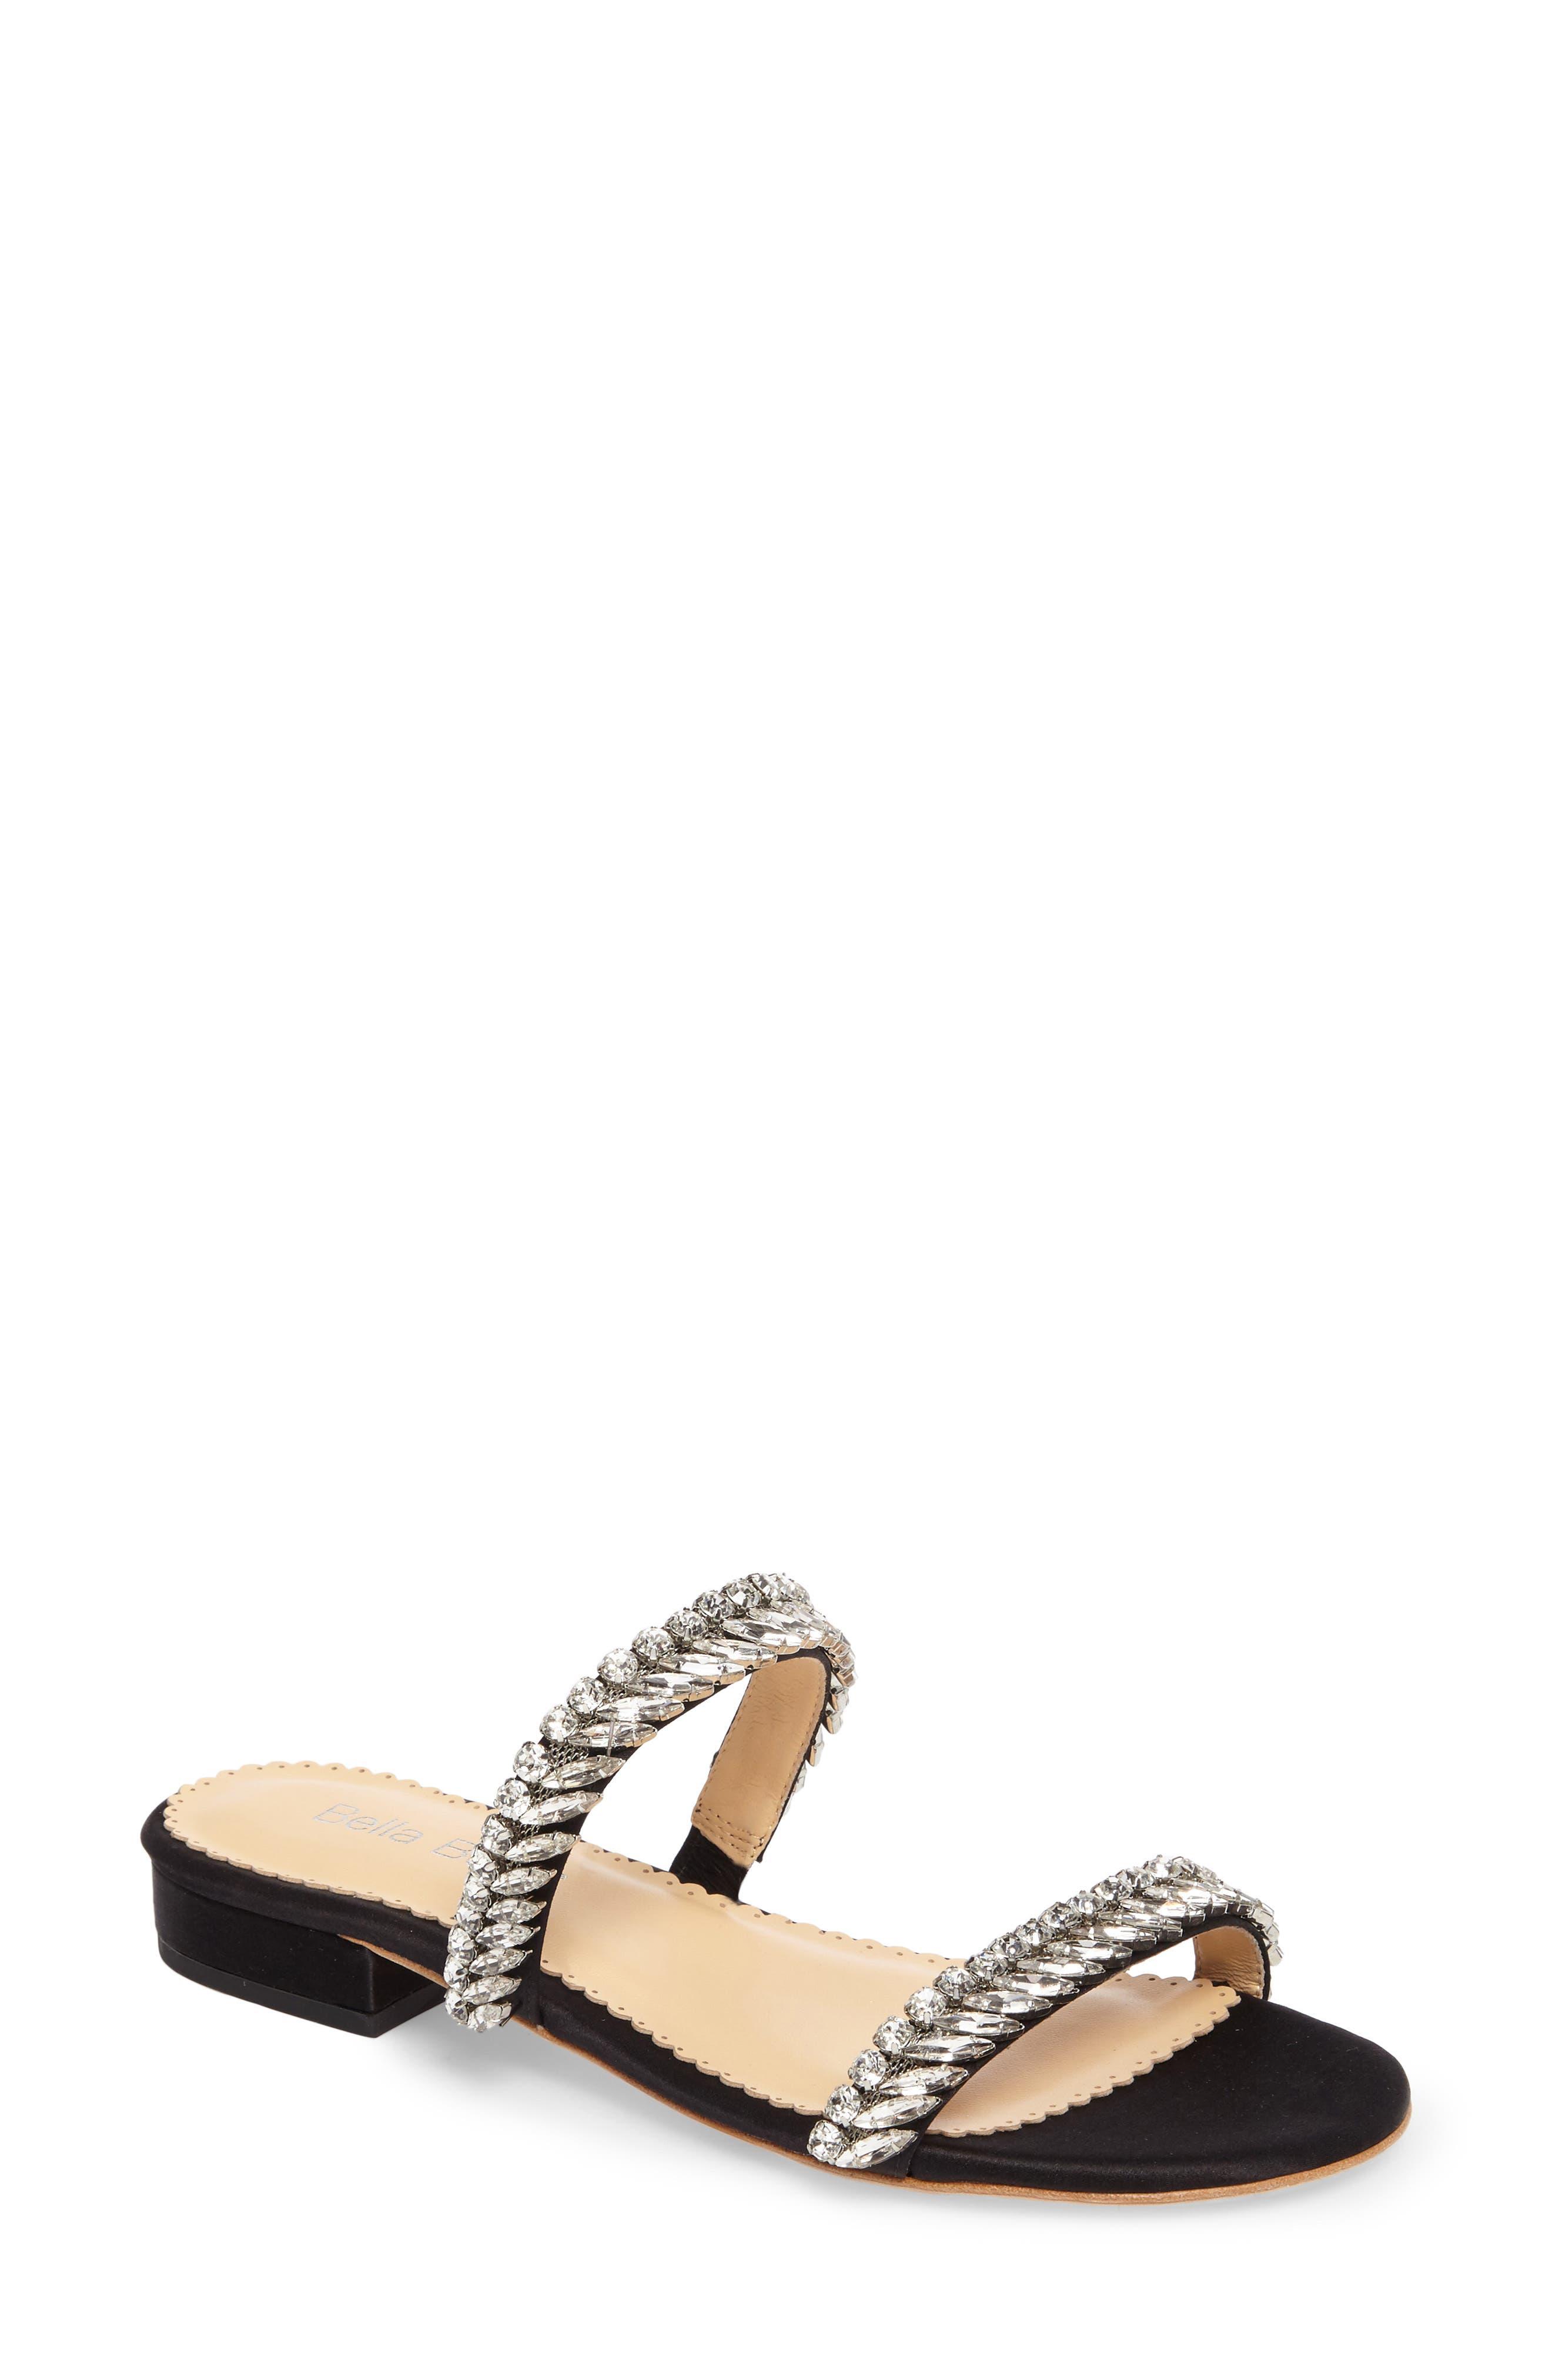 Bree Jeweled Evening Sandal,                         Main,                         color, BLACK